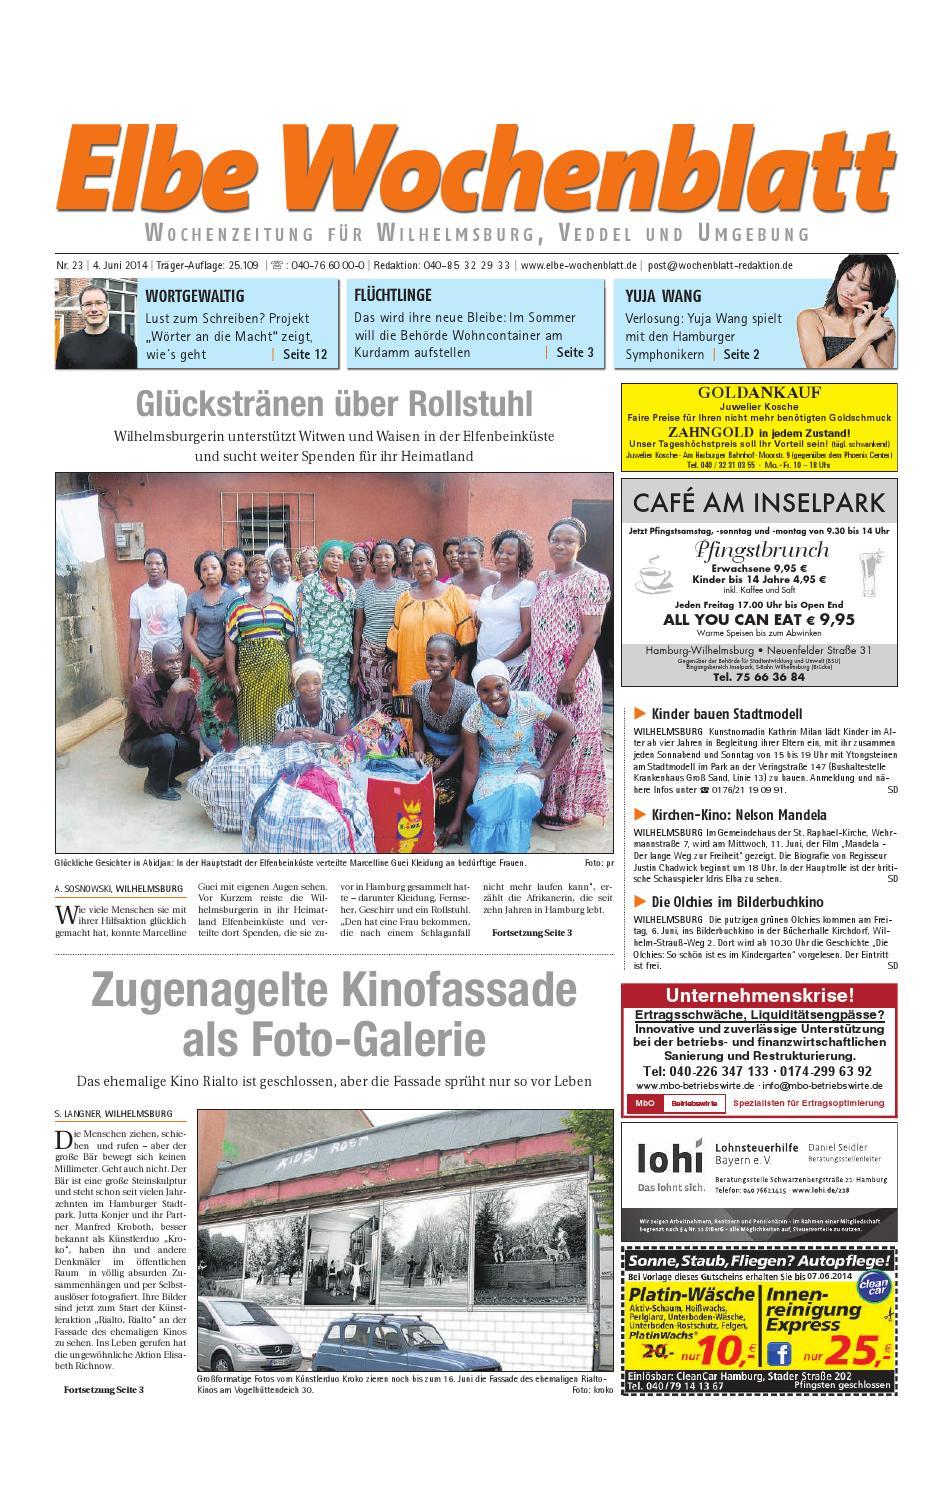 Wilhelmsburg KW23-2014 by Elbe Wochenblatt Verlagsgesellschaft mbH & Co.KG  - issuu